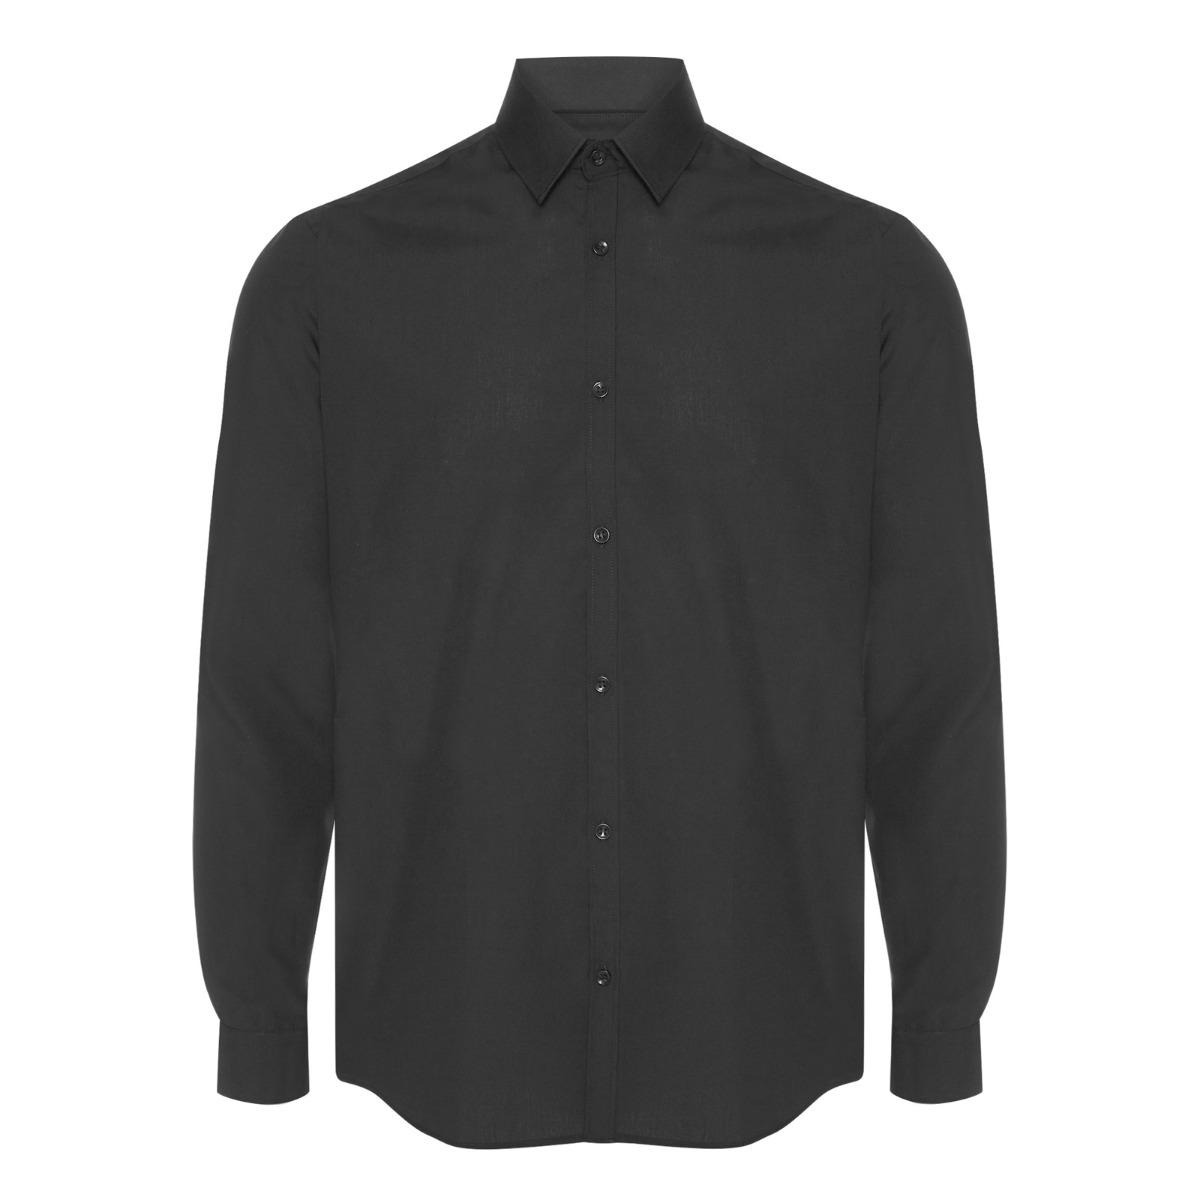 Mens-Black-Formal-Shirt-Long-Sleeve-Regular-Fit-Plain-Business-Work-Collar-Smart thumbnail 4